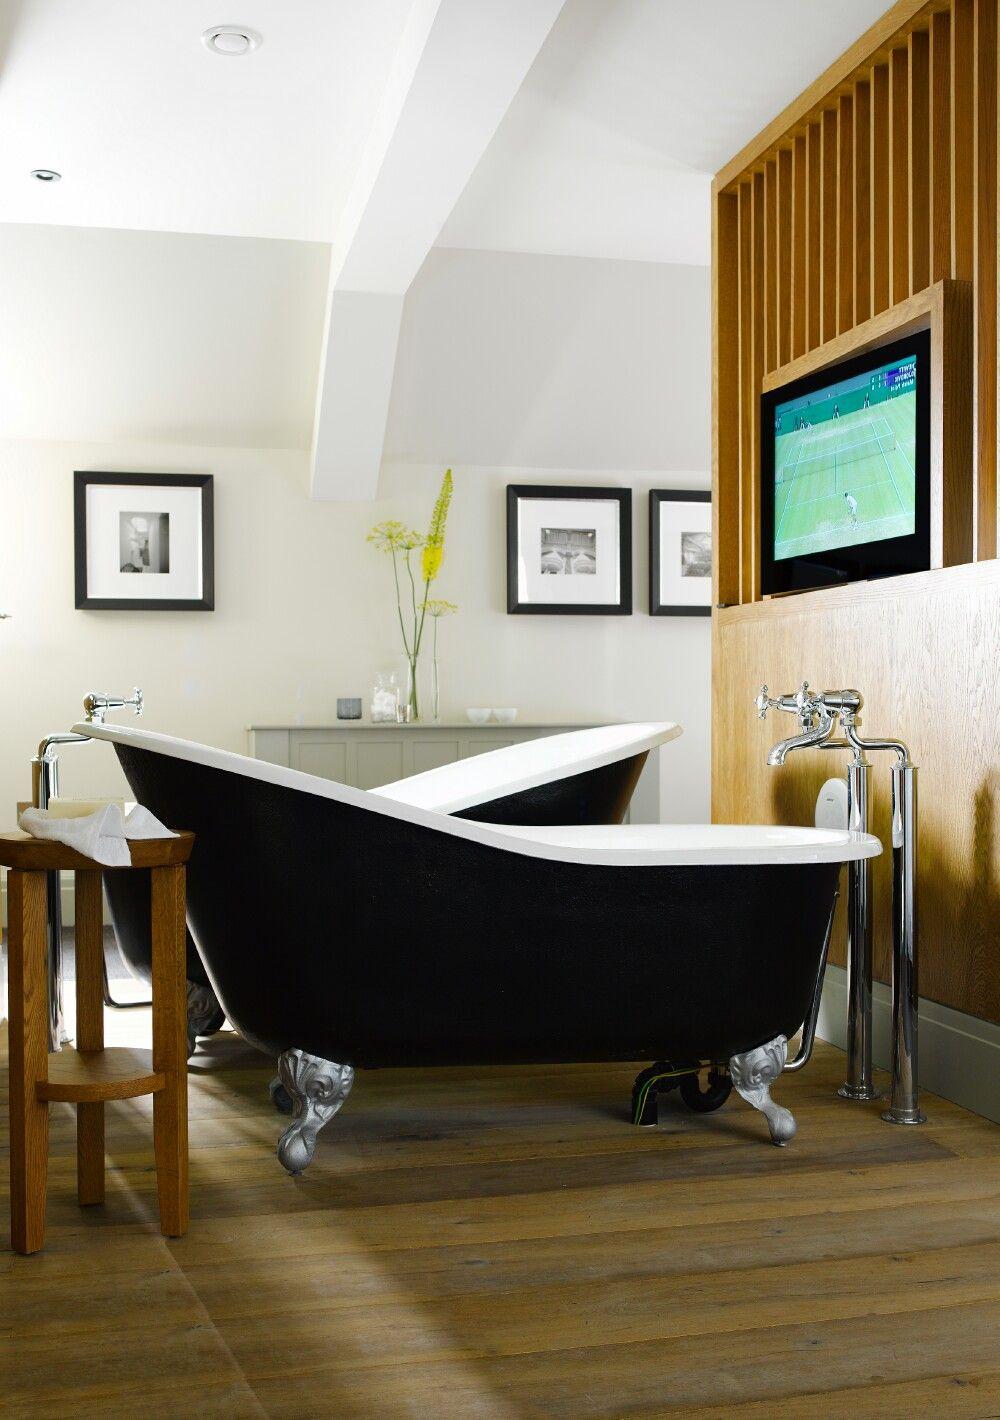 Bathroom Inspiration From Aston Matthews Http://www.